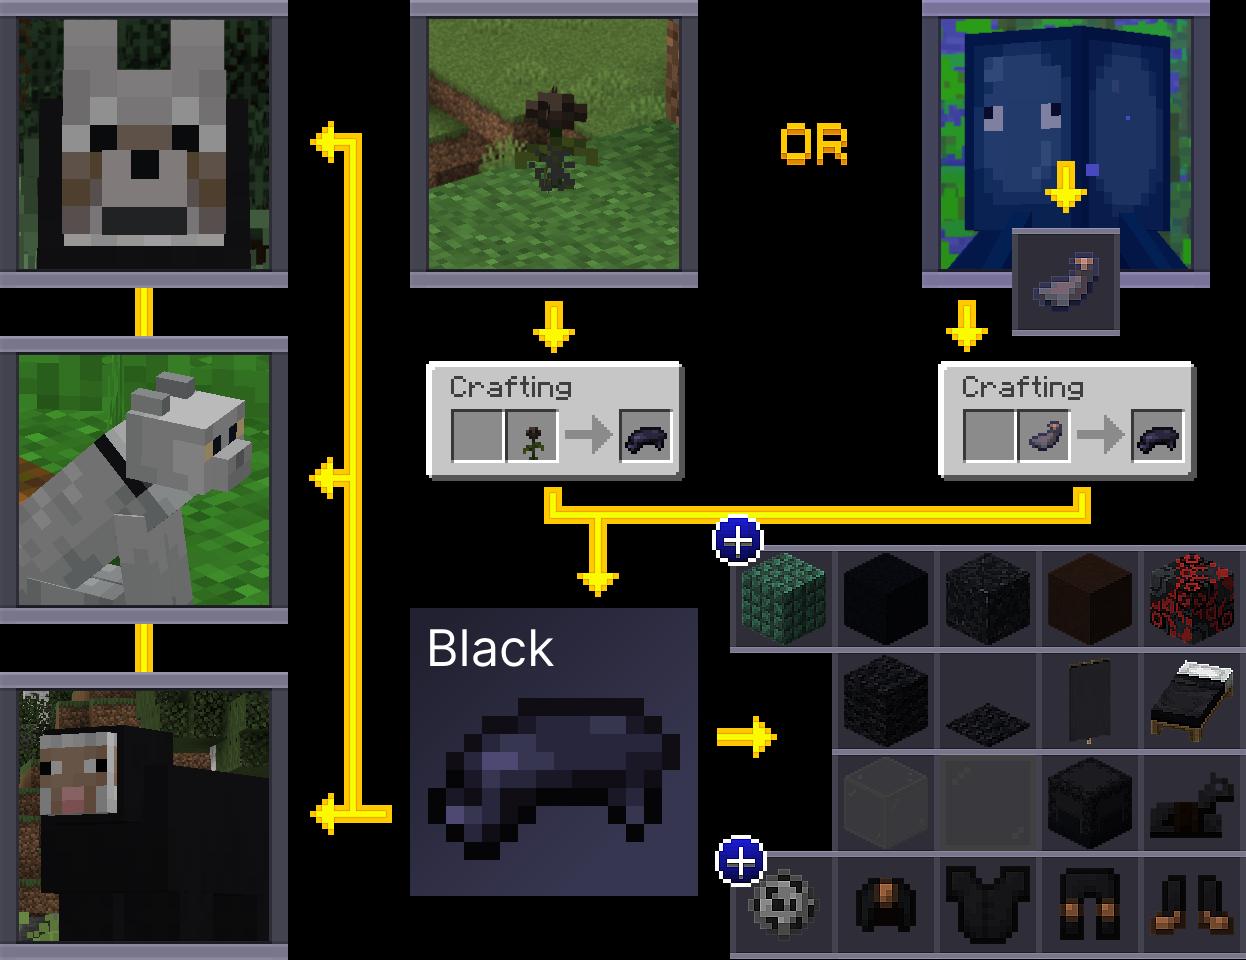 How to Get Black Dye in Minecraft